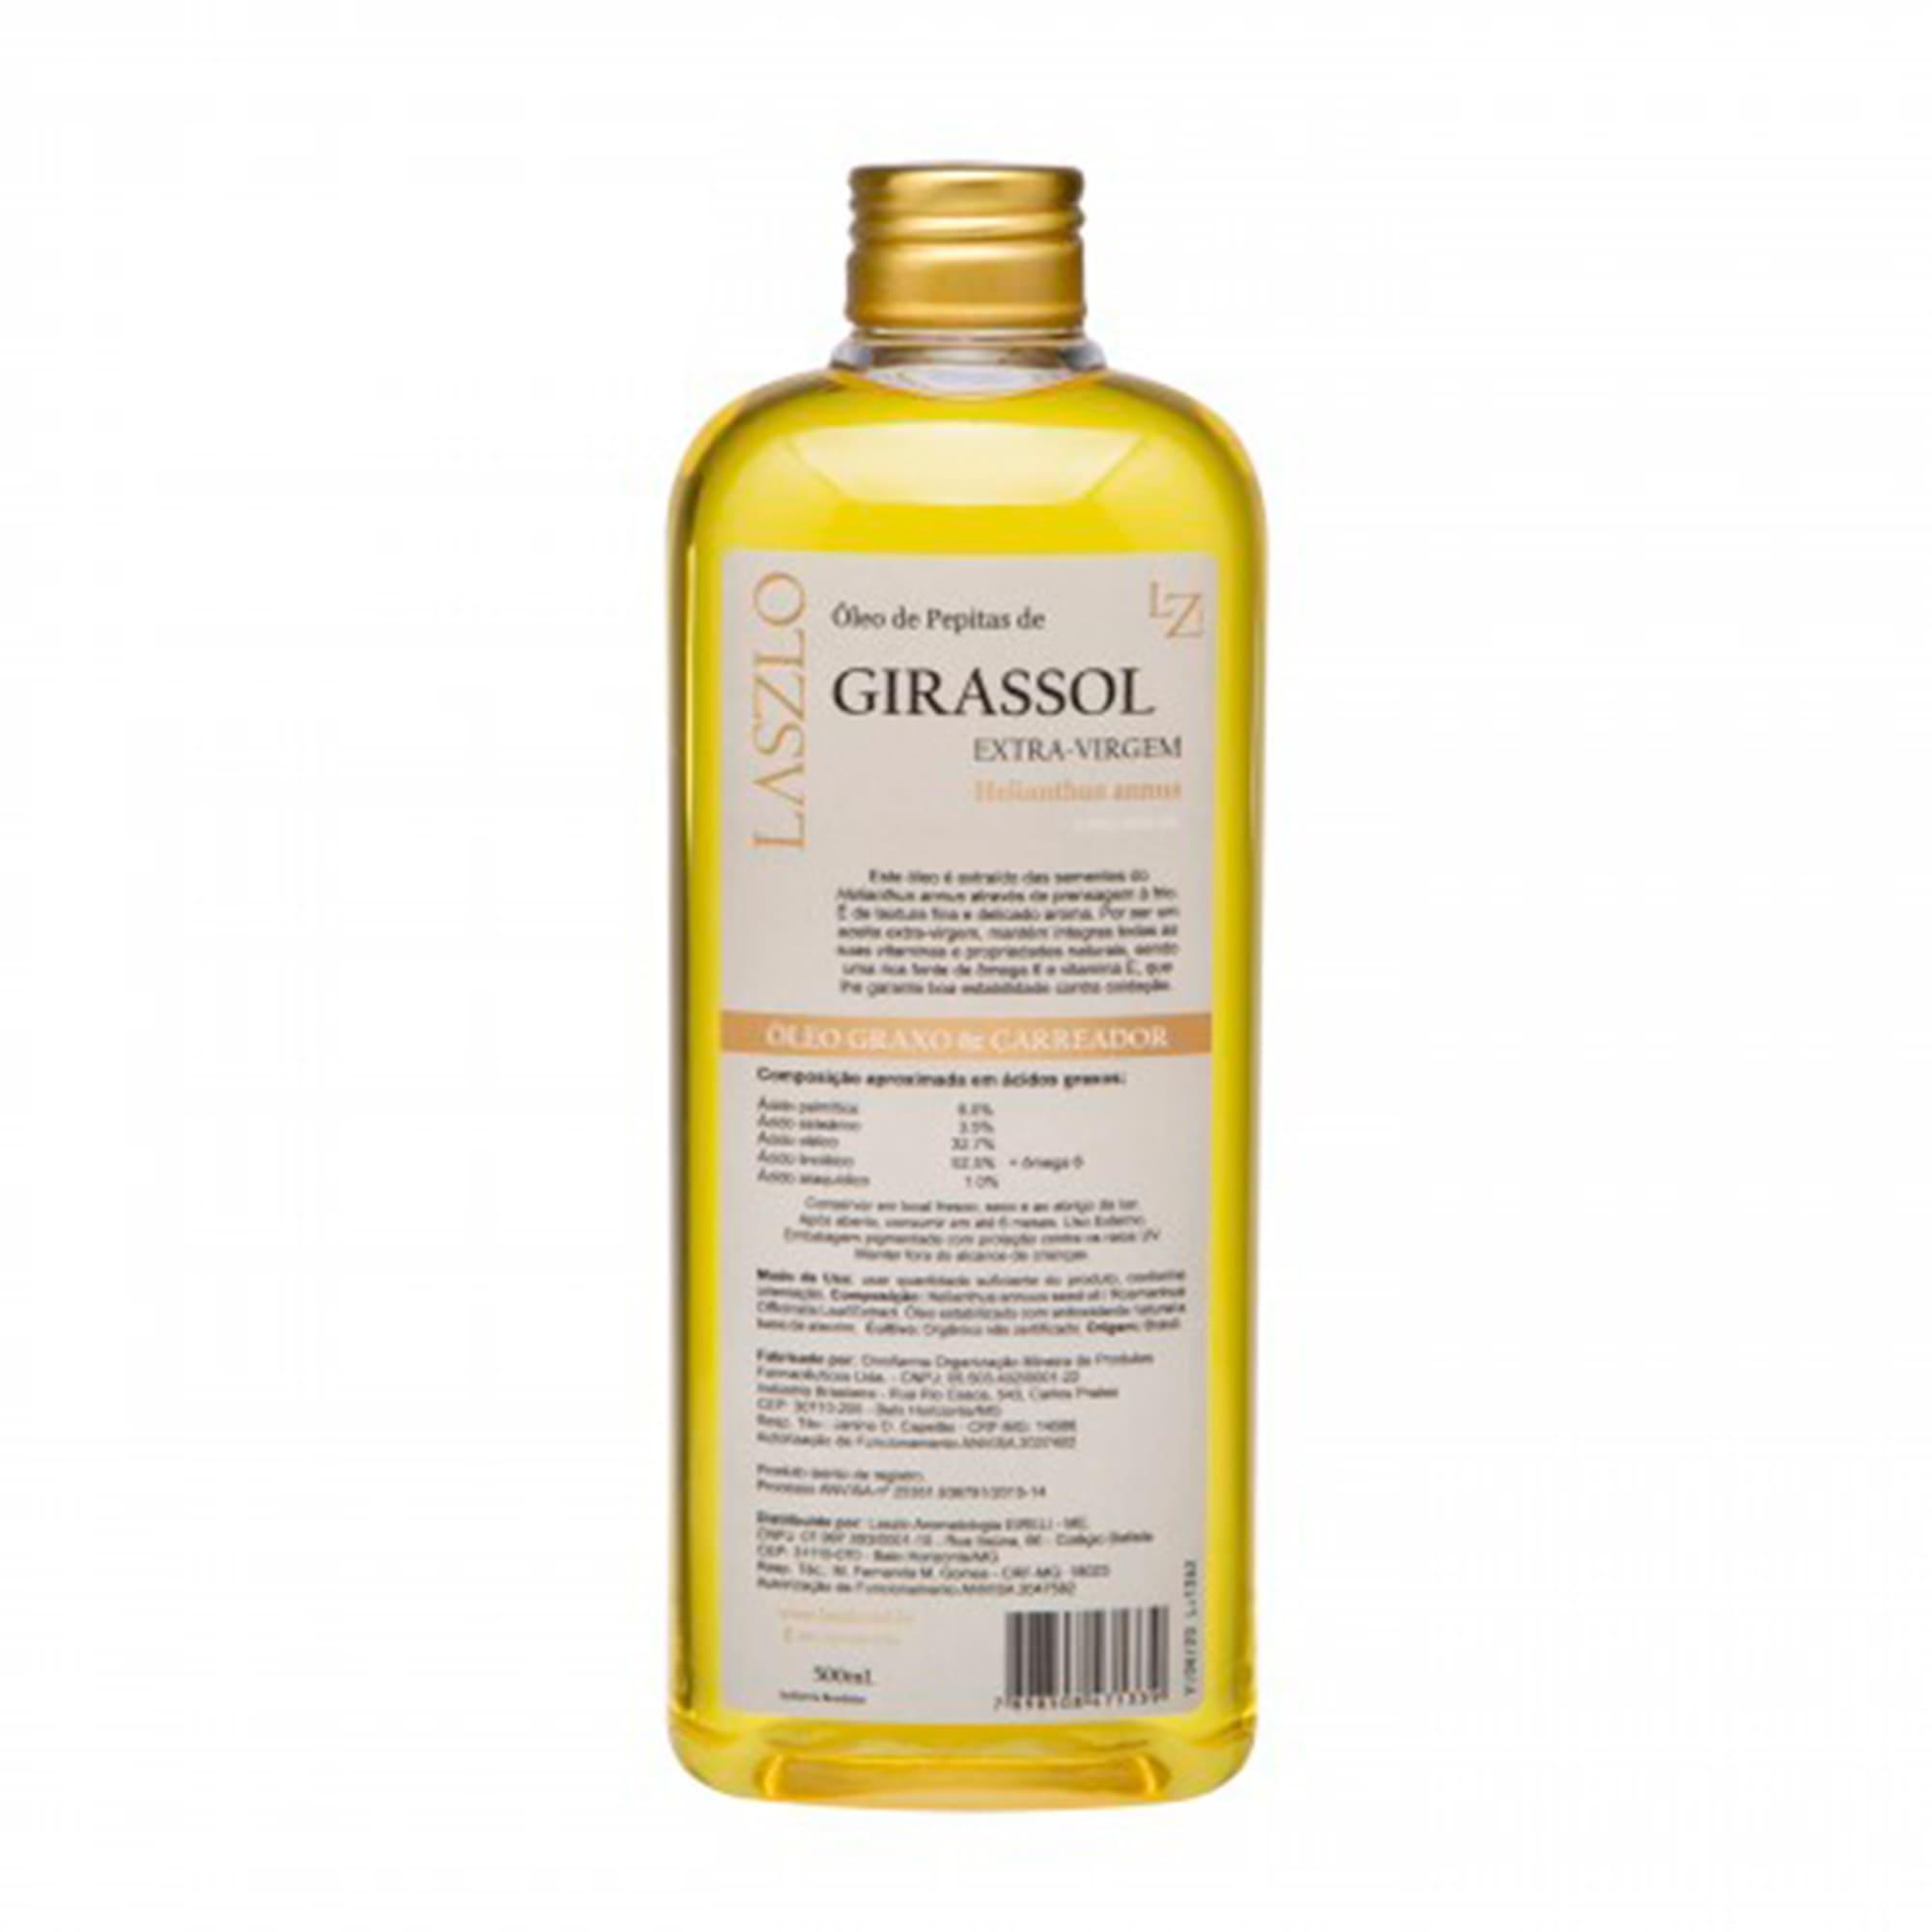 Óleo Vegetal de Girassol (pepitas) Extra-Virgem 500ml - Laszlo